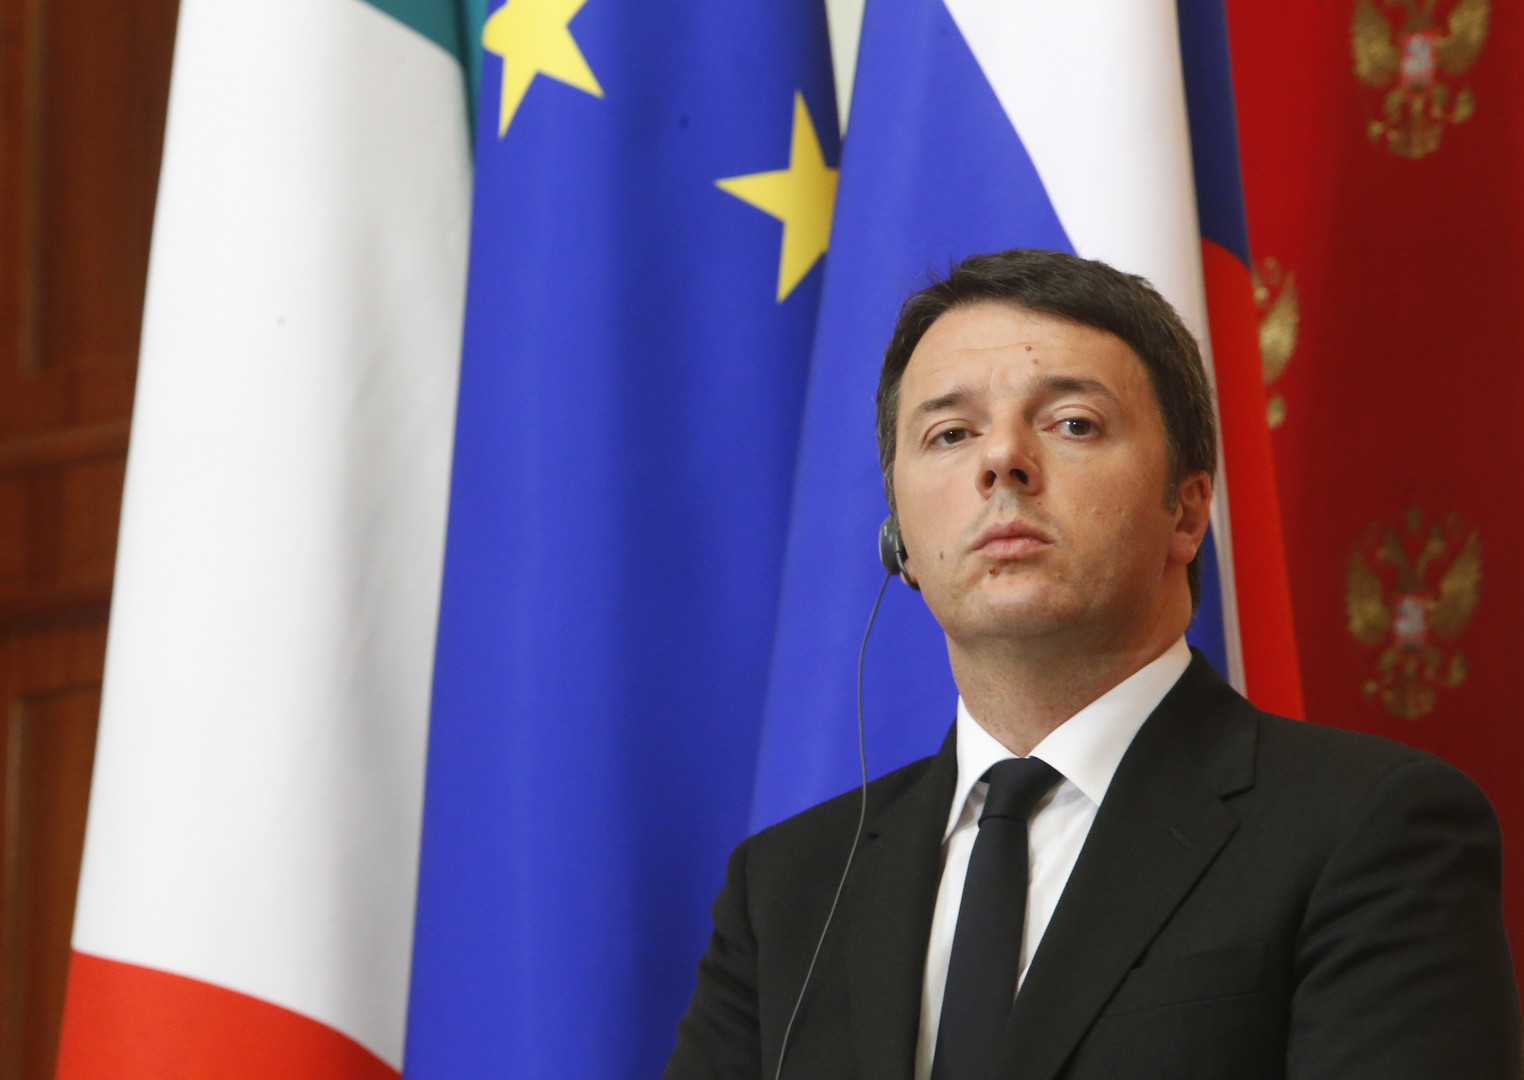 Matteo Renzi lors de sa visite à Moscou le 5 mars 2015.